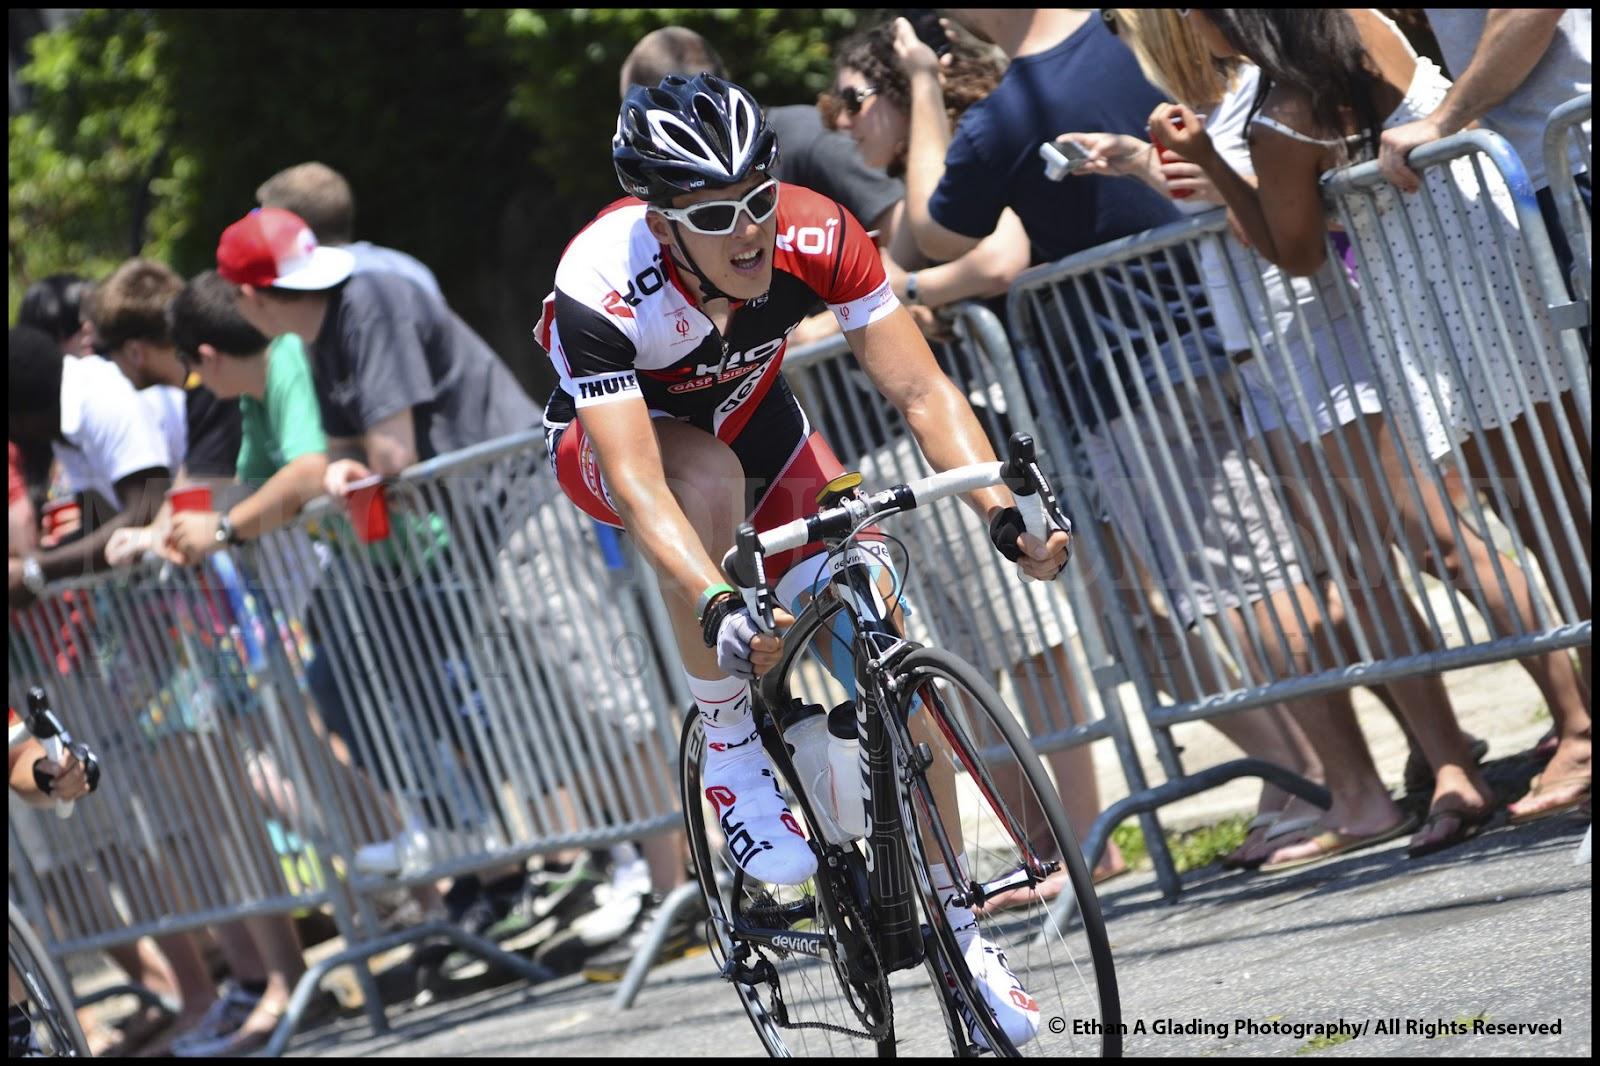 Serebryakov wins big in philadelphia miroir du cyclisme for Miroir du ciclisme